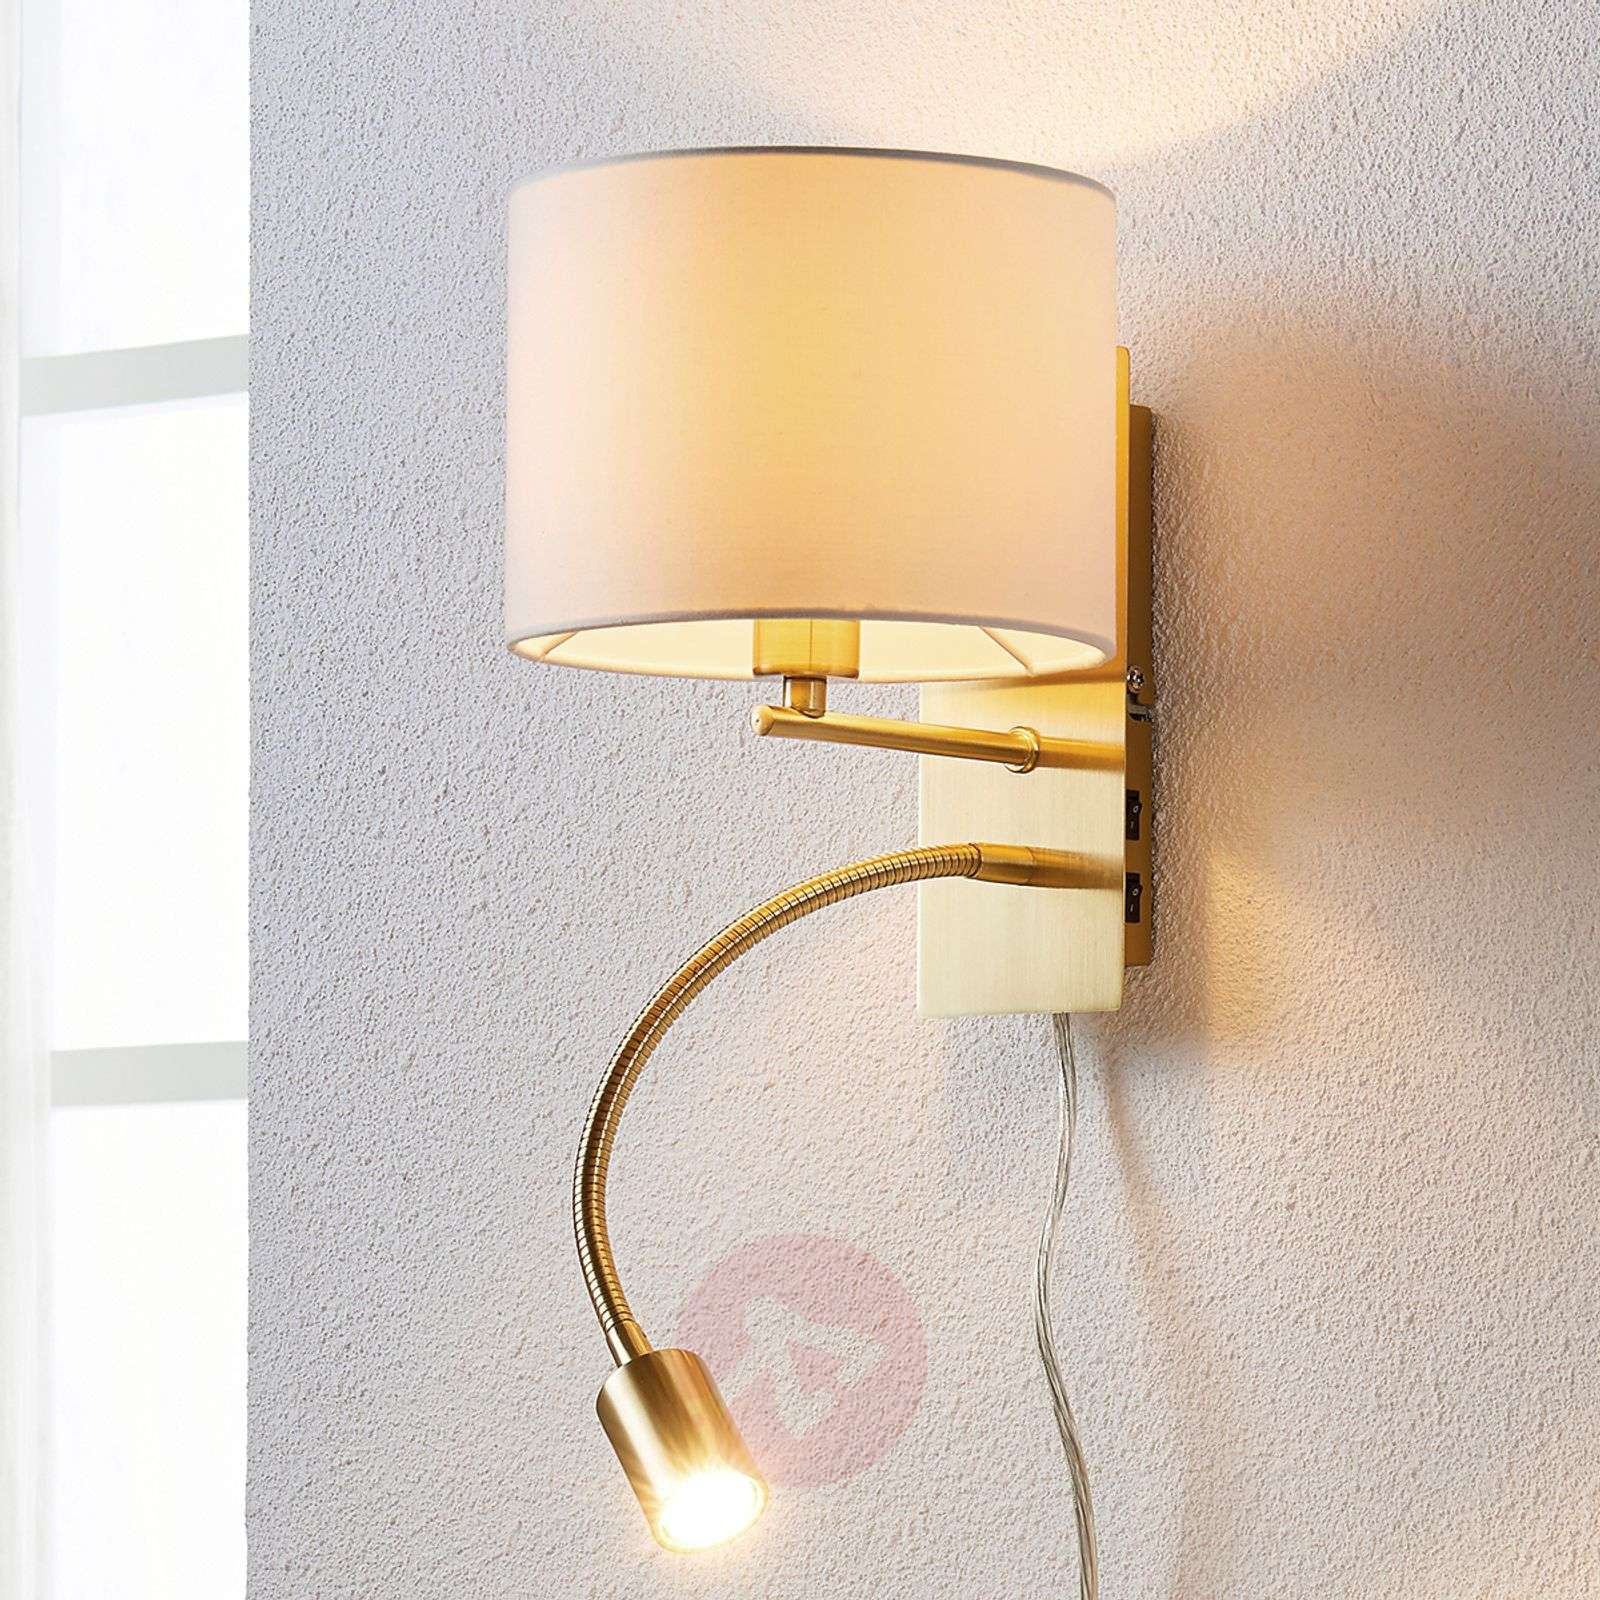 Messinginvär. seinävalaisin Florens, LED-lukuvalo-9620923-03